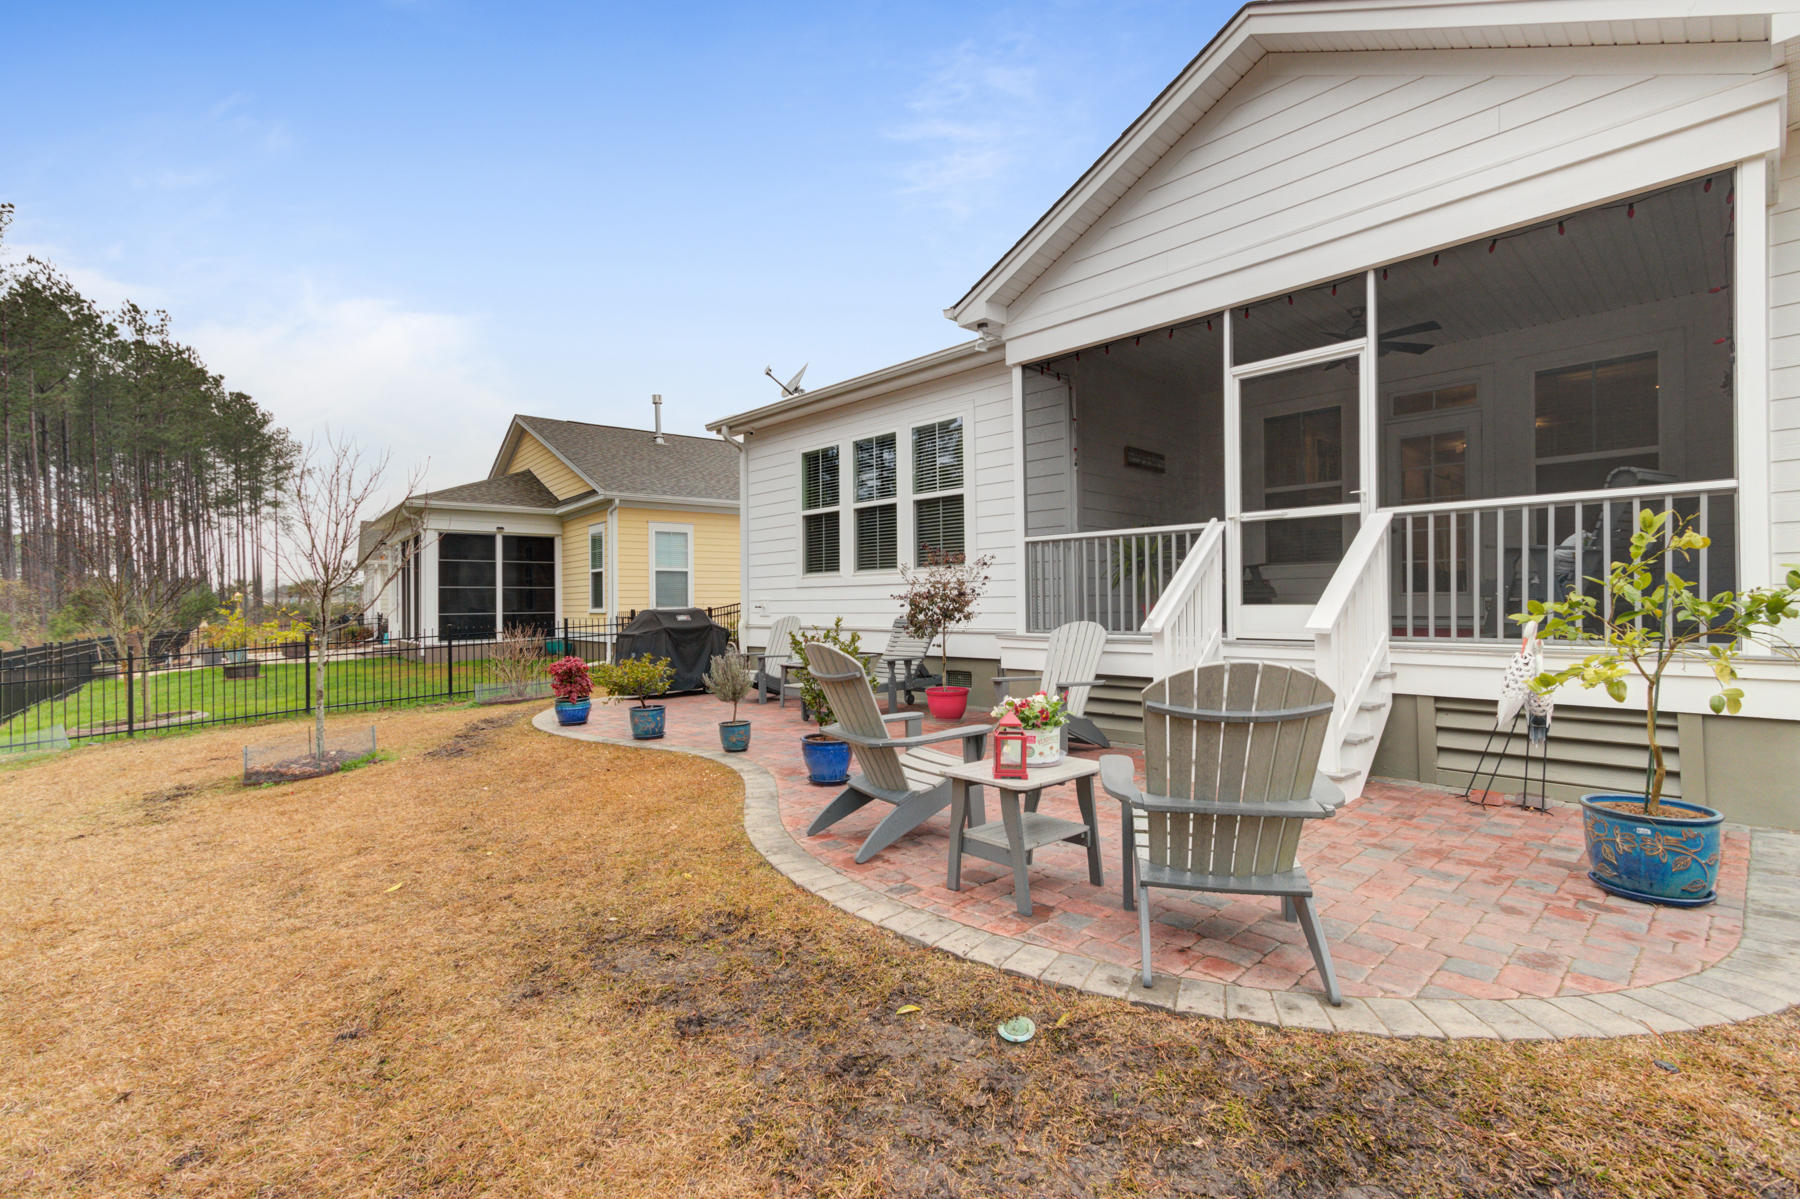 Cane Bay Plantation Homes For Sale - 251 Calm Water, Summerville, SC - 12